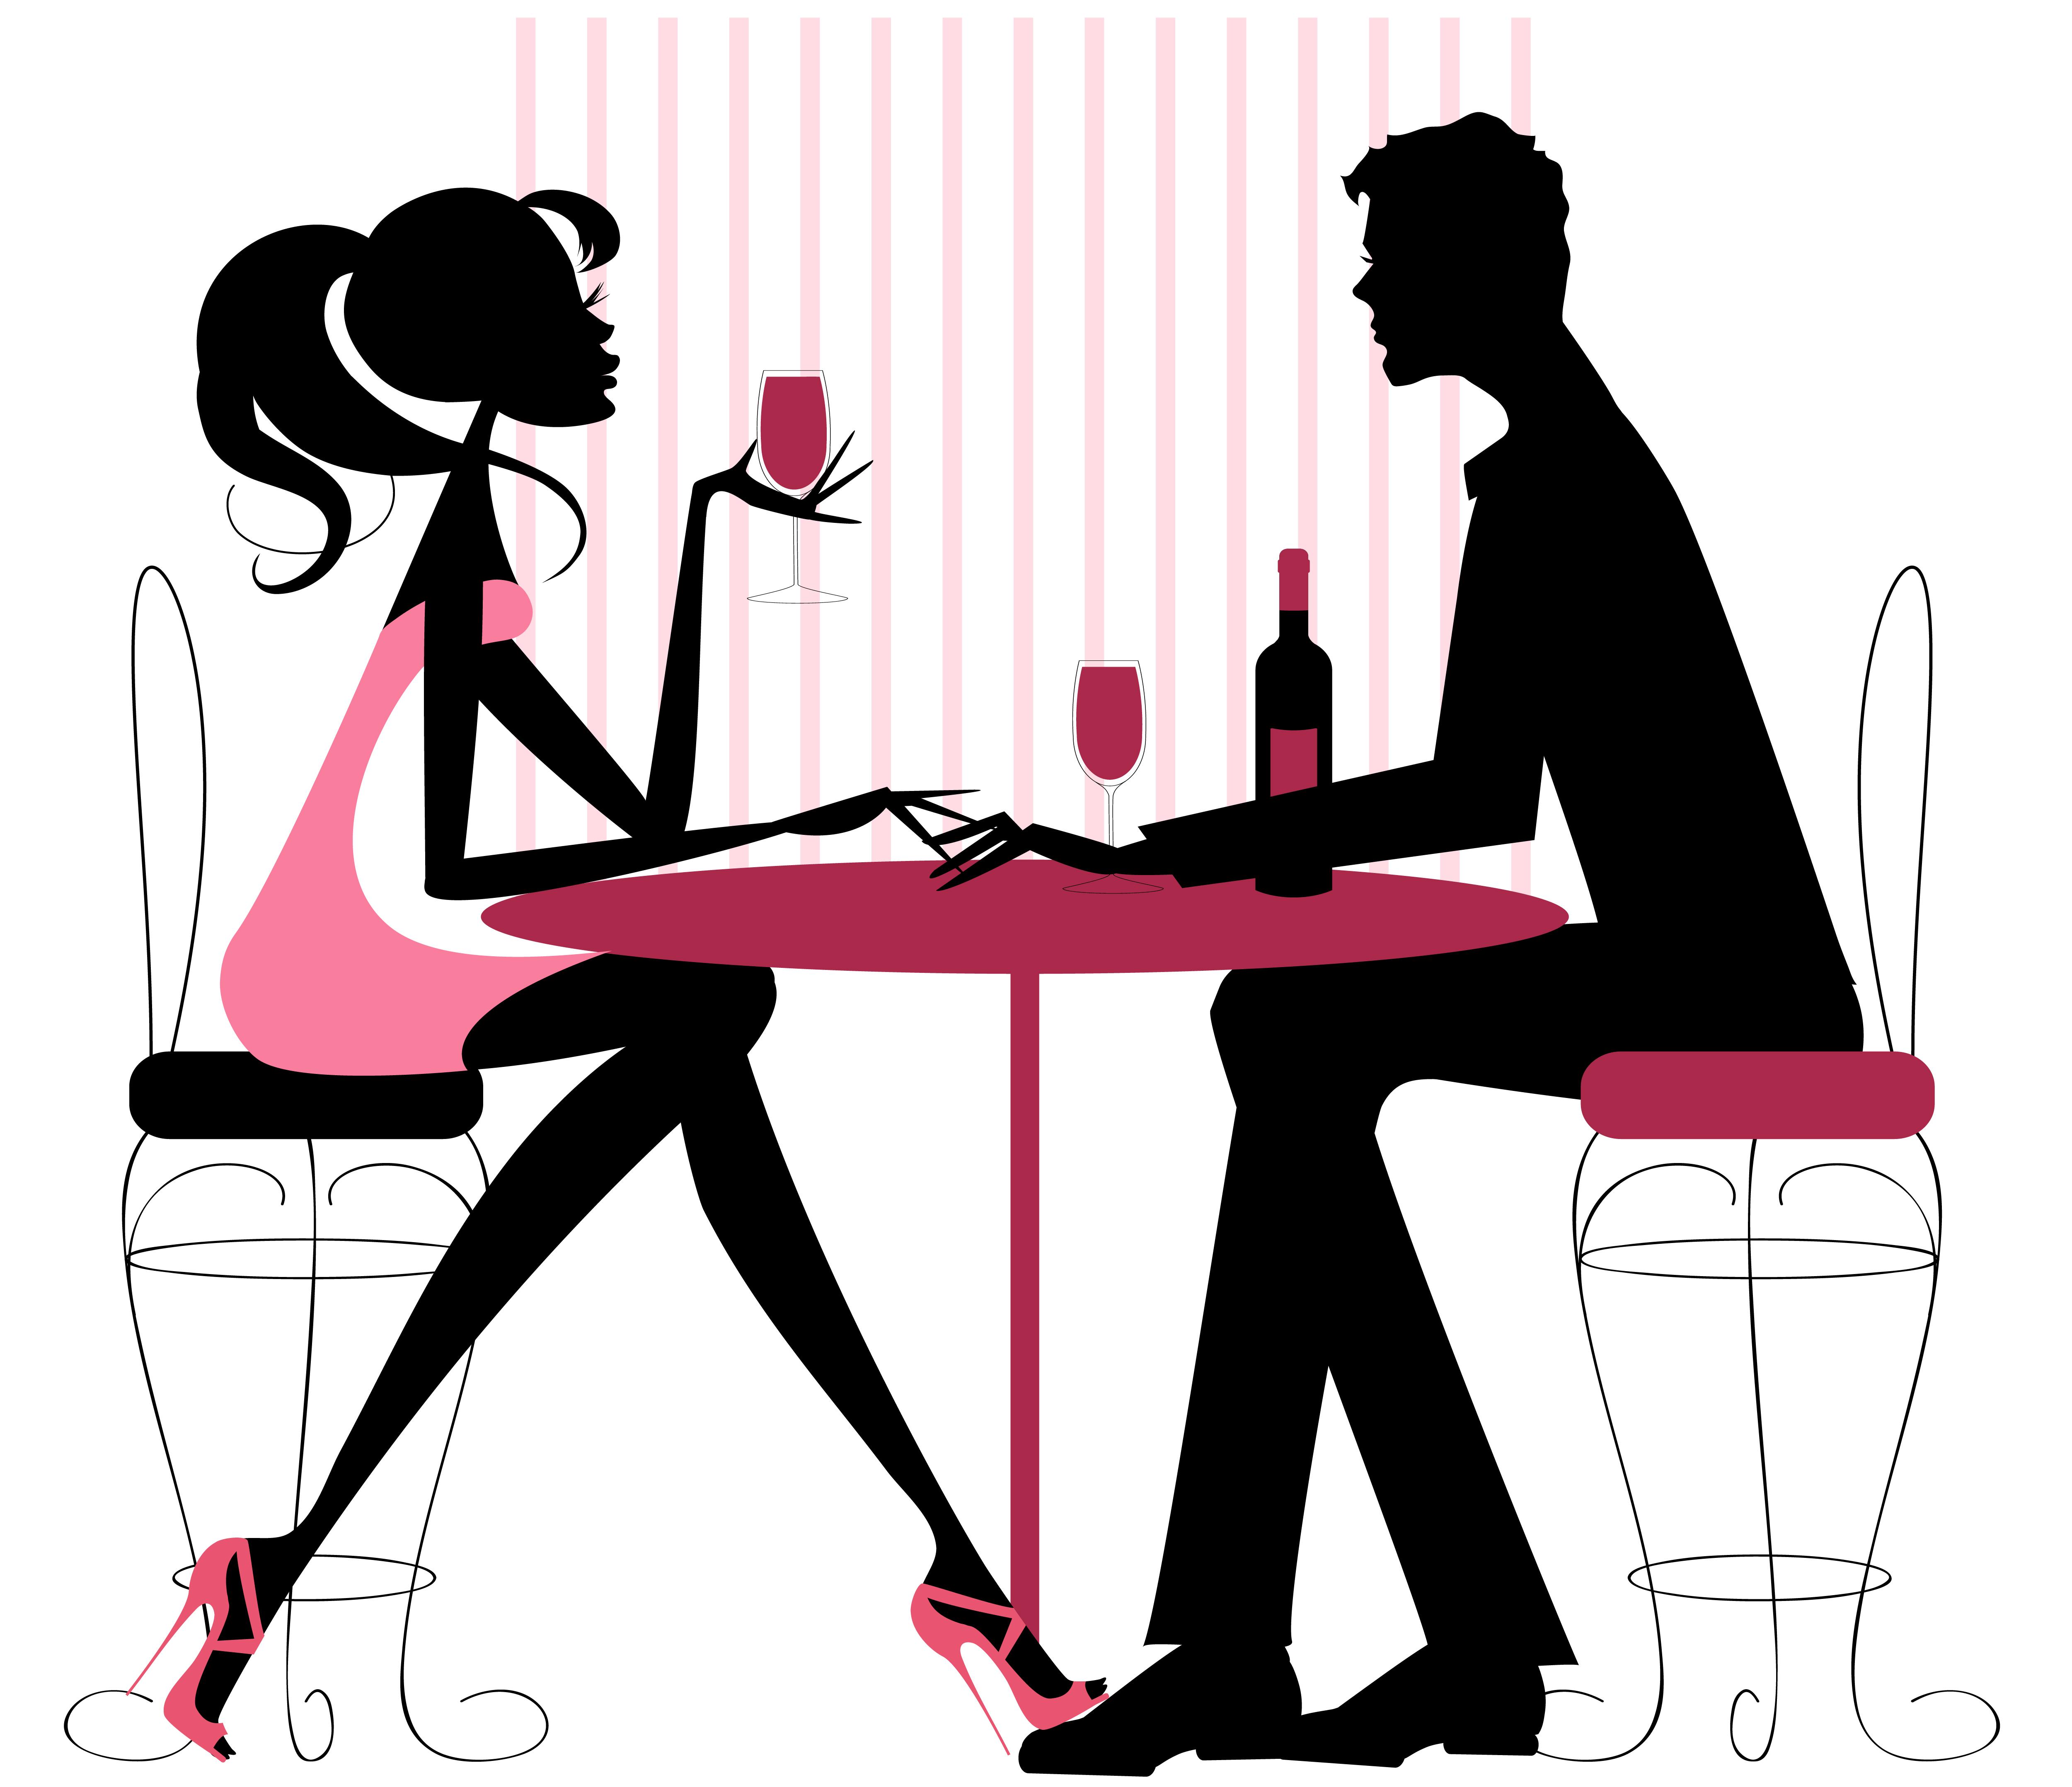 Фортуна сайт знакомств 15 фотография